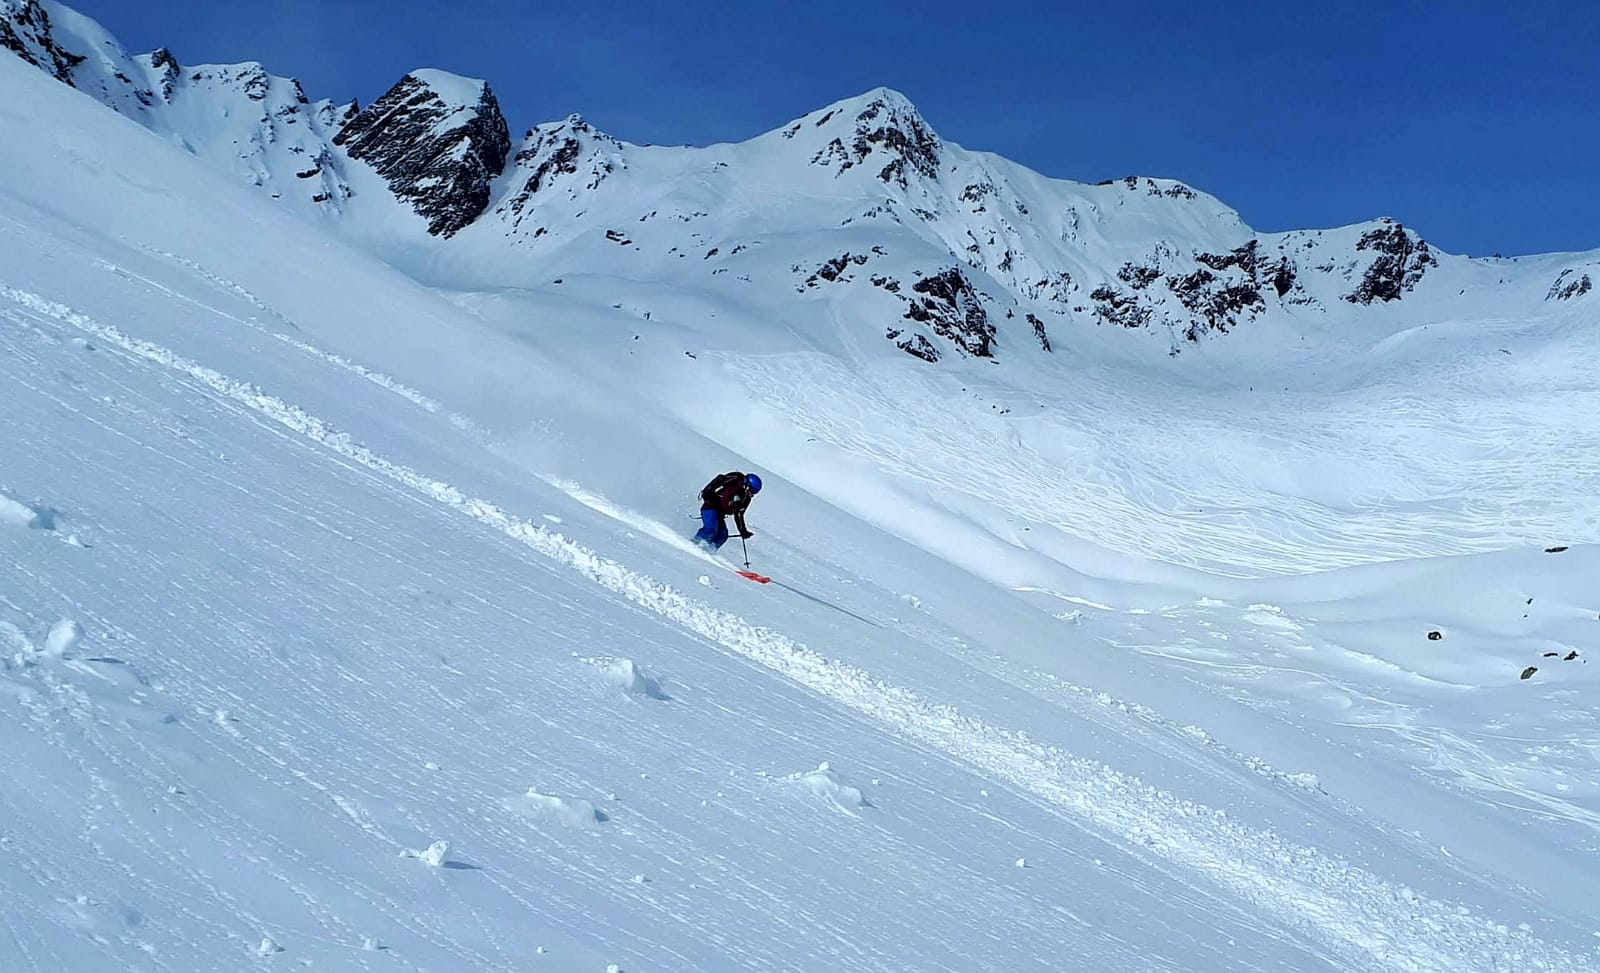 Sofia Muigg fühlt sich auch auf Schnee sehr wohl, Foto: Quirin Chalupar |Climbers Paradise